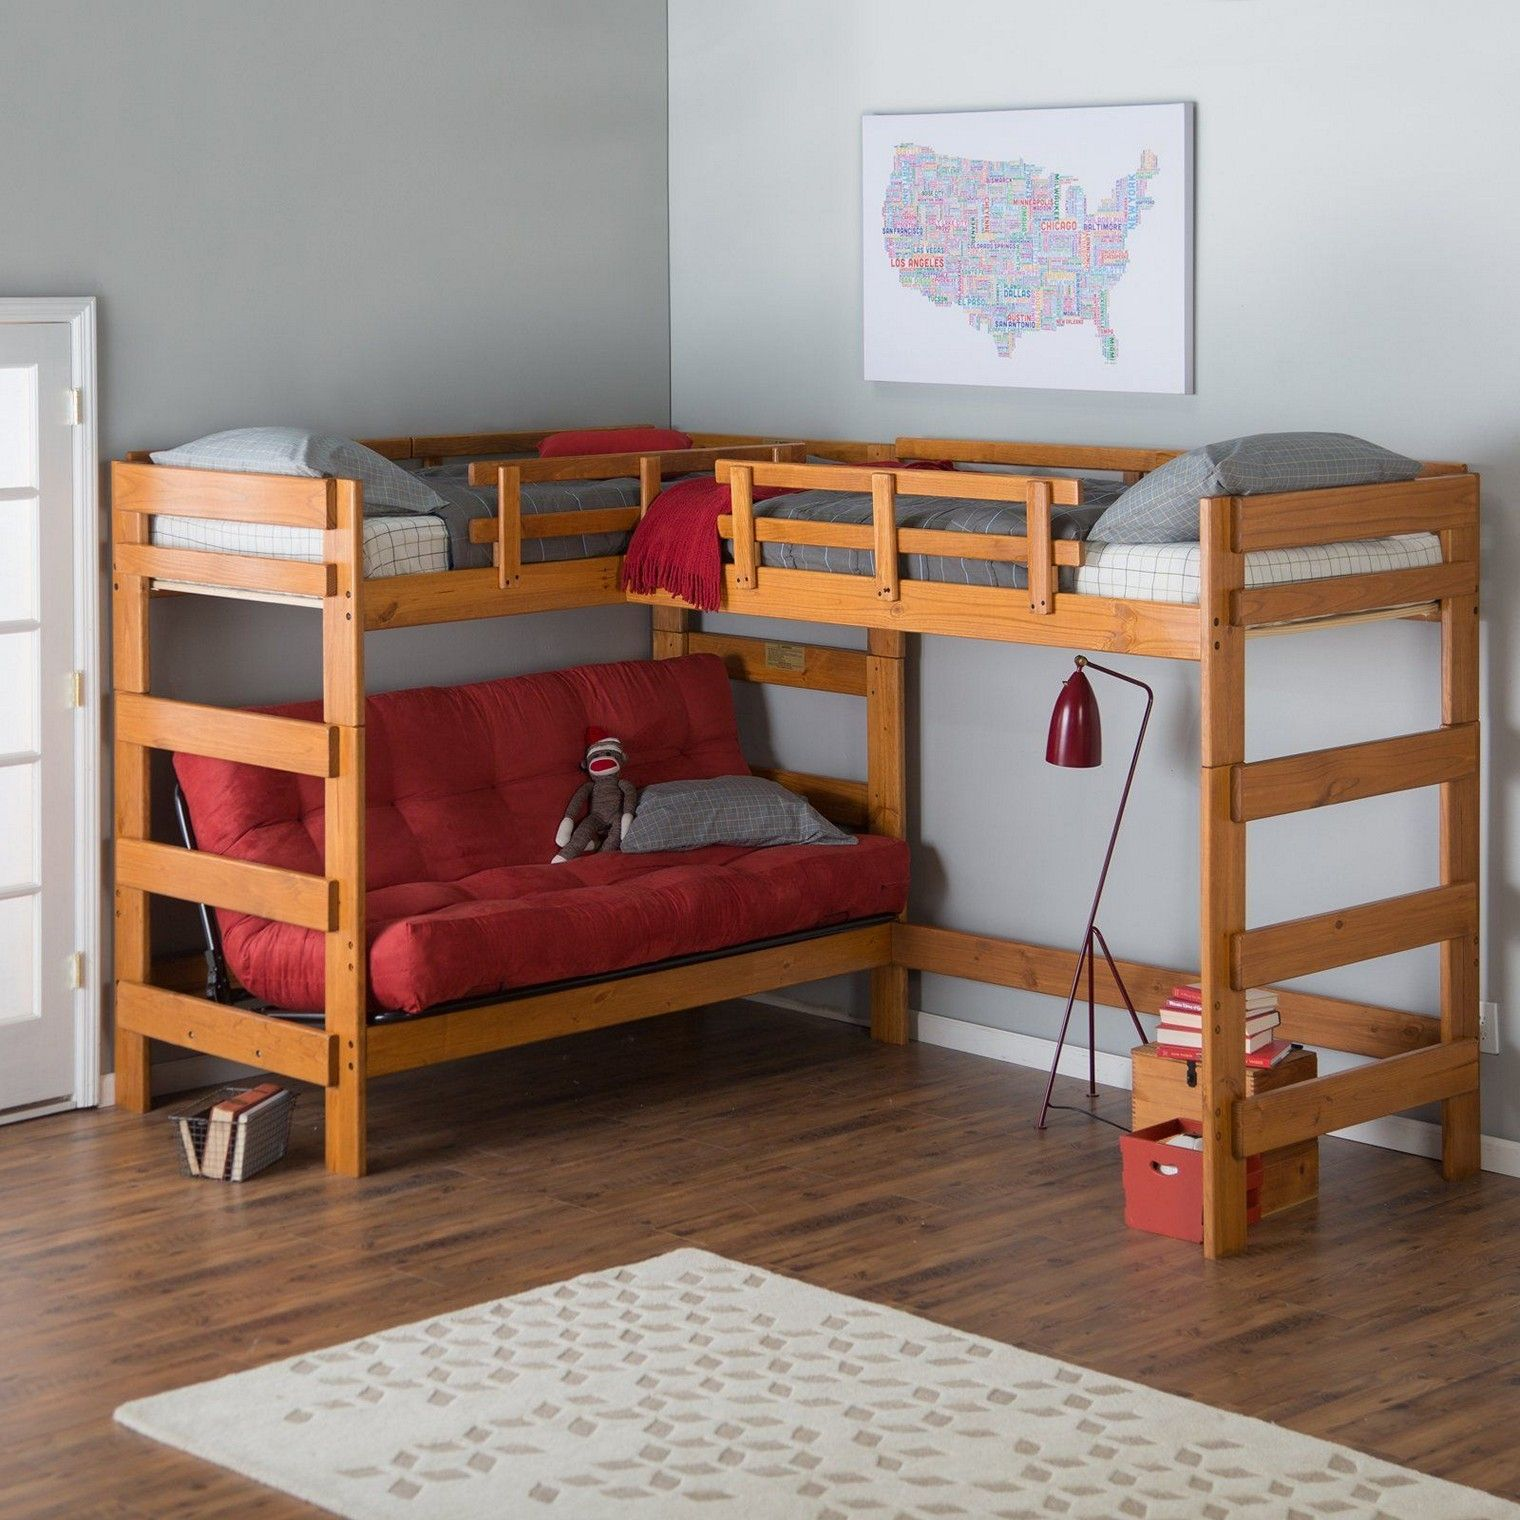 Queen loft bed with stairs  Hochbett Ideen Schlafzimmer Komplett  Kinderus Zimmer  Pinterest